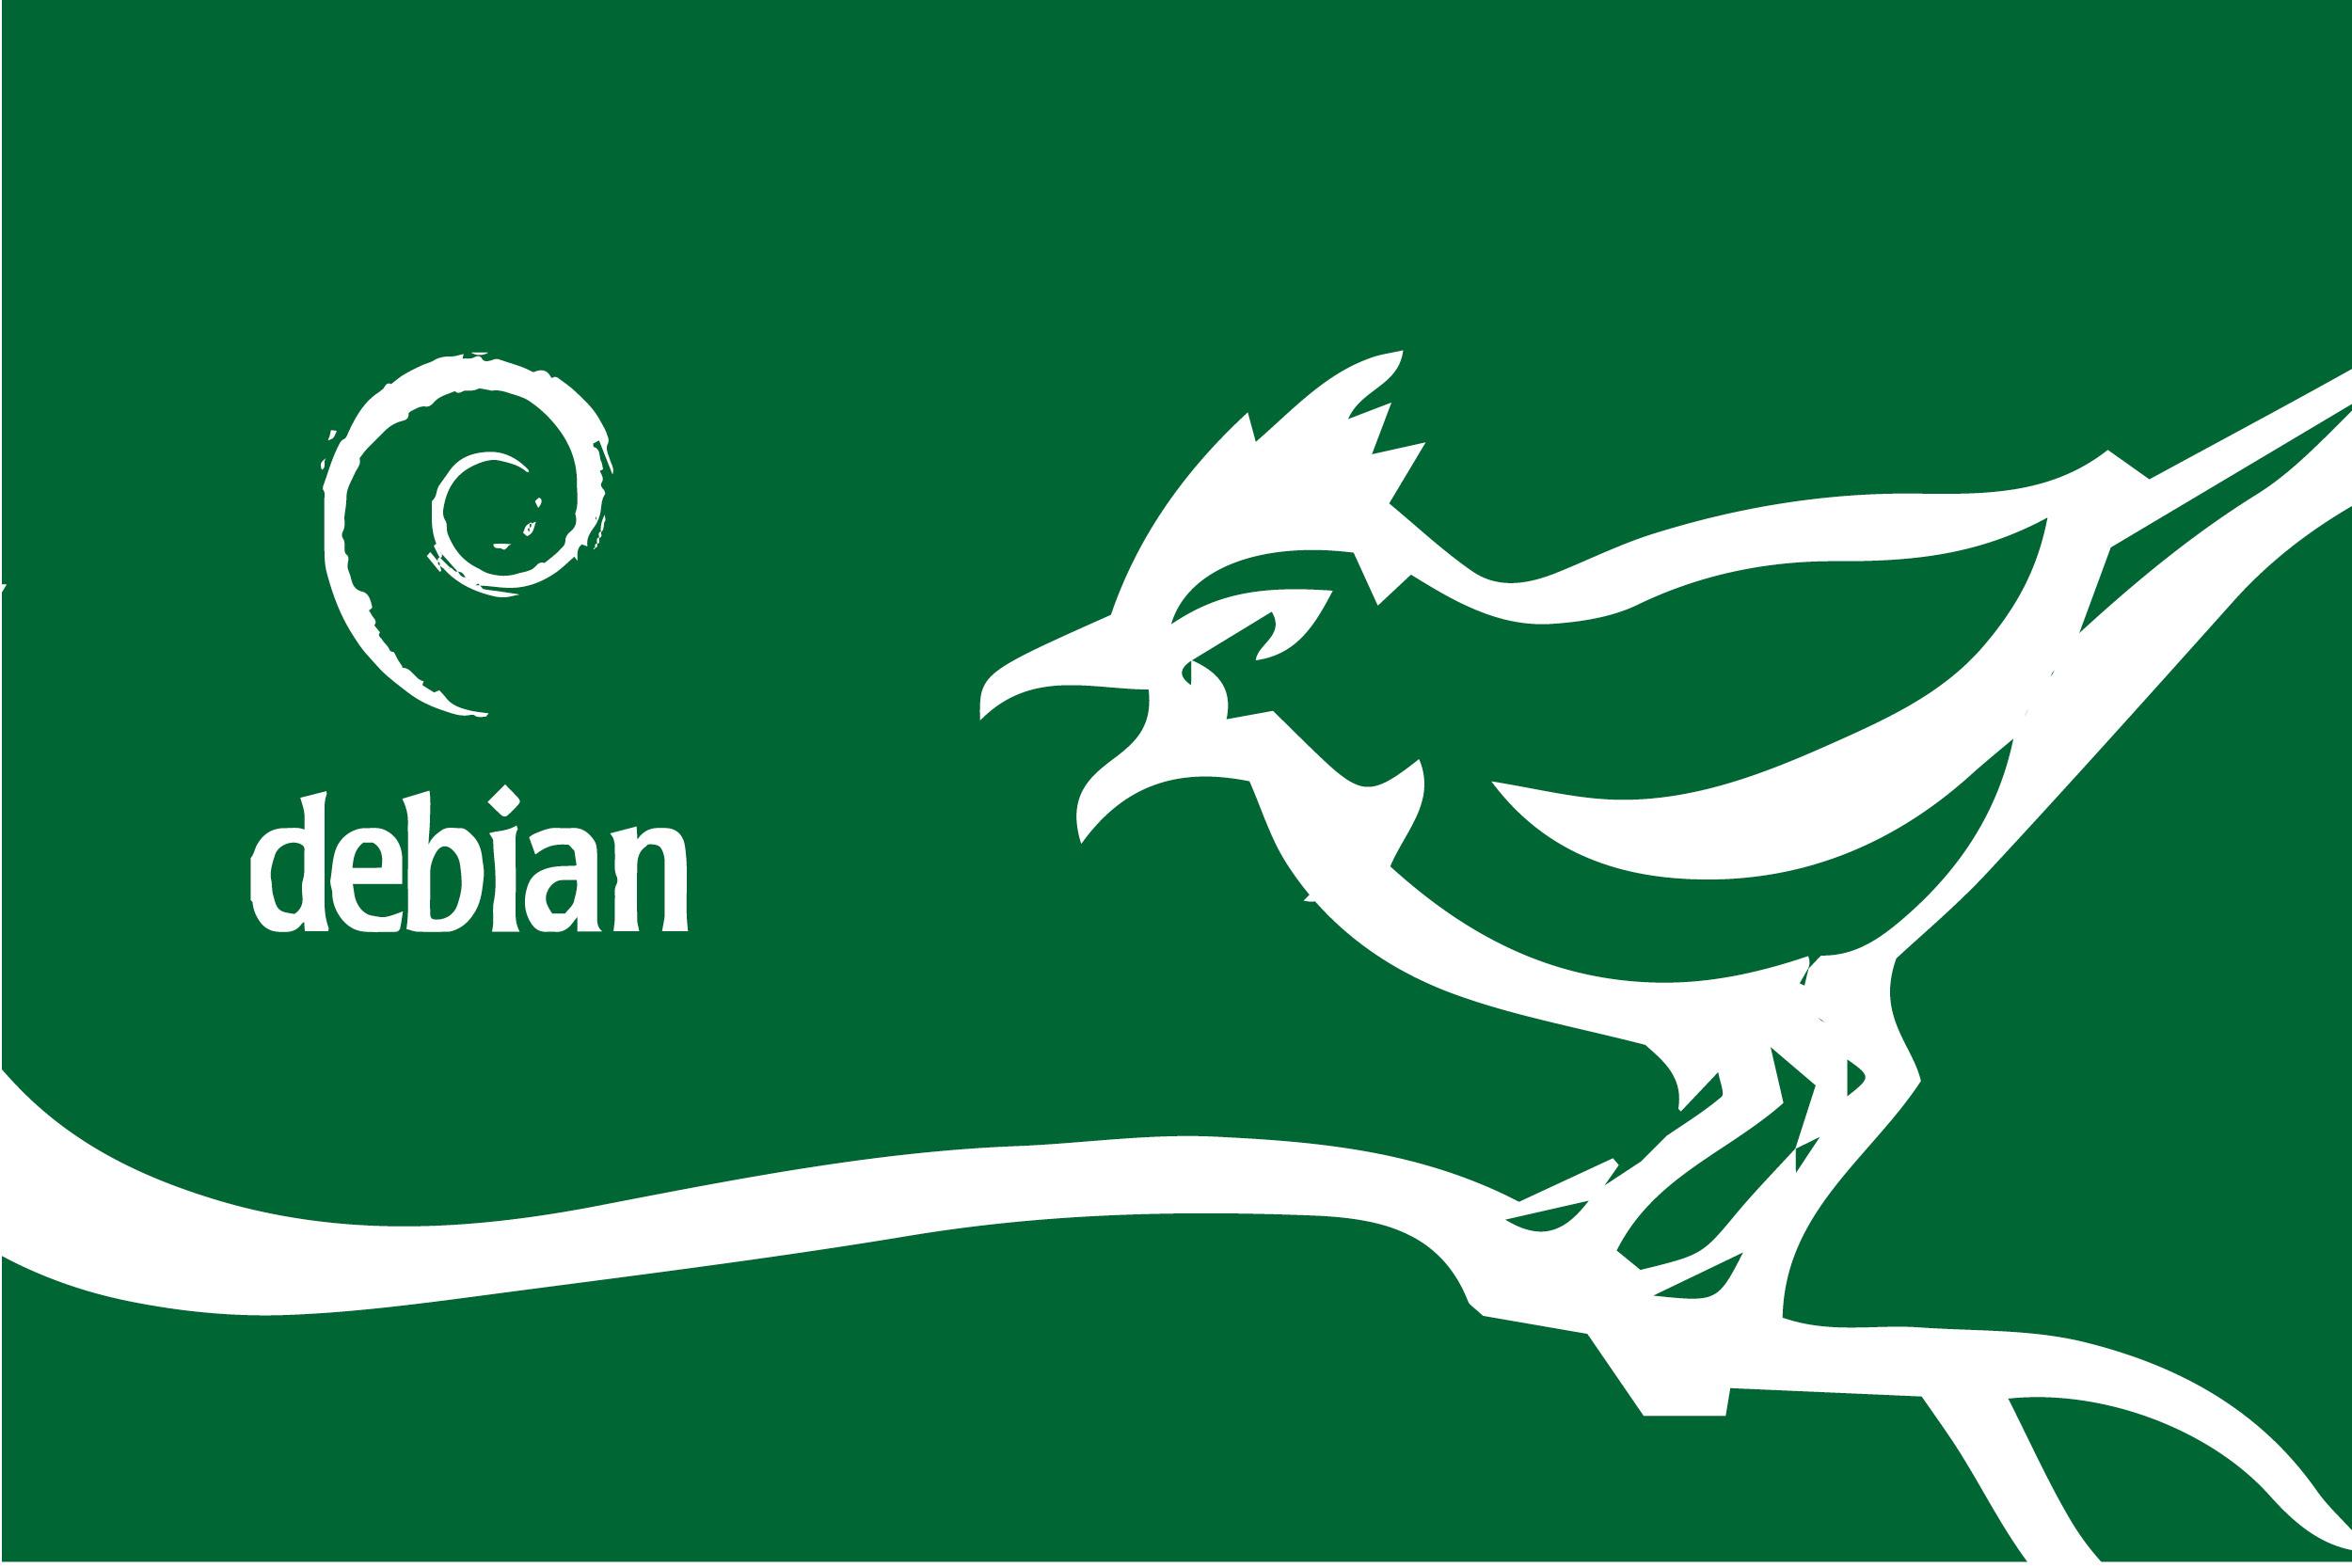 Debian logo graphic